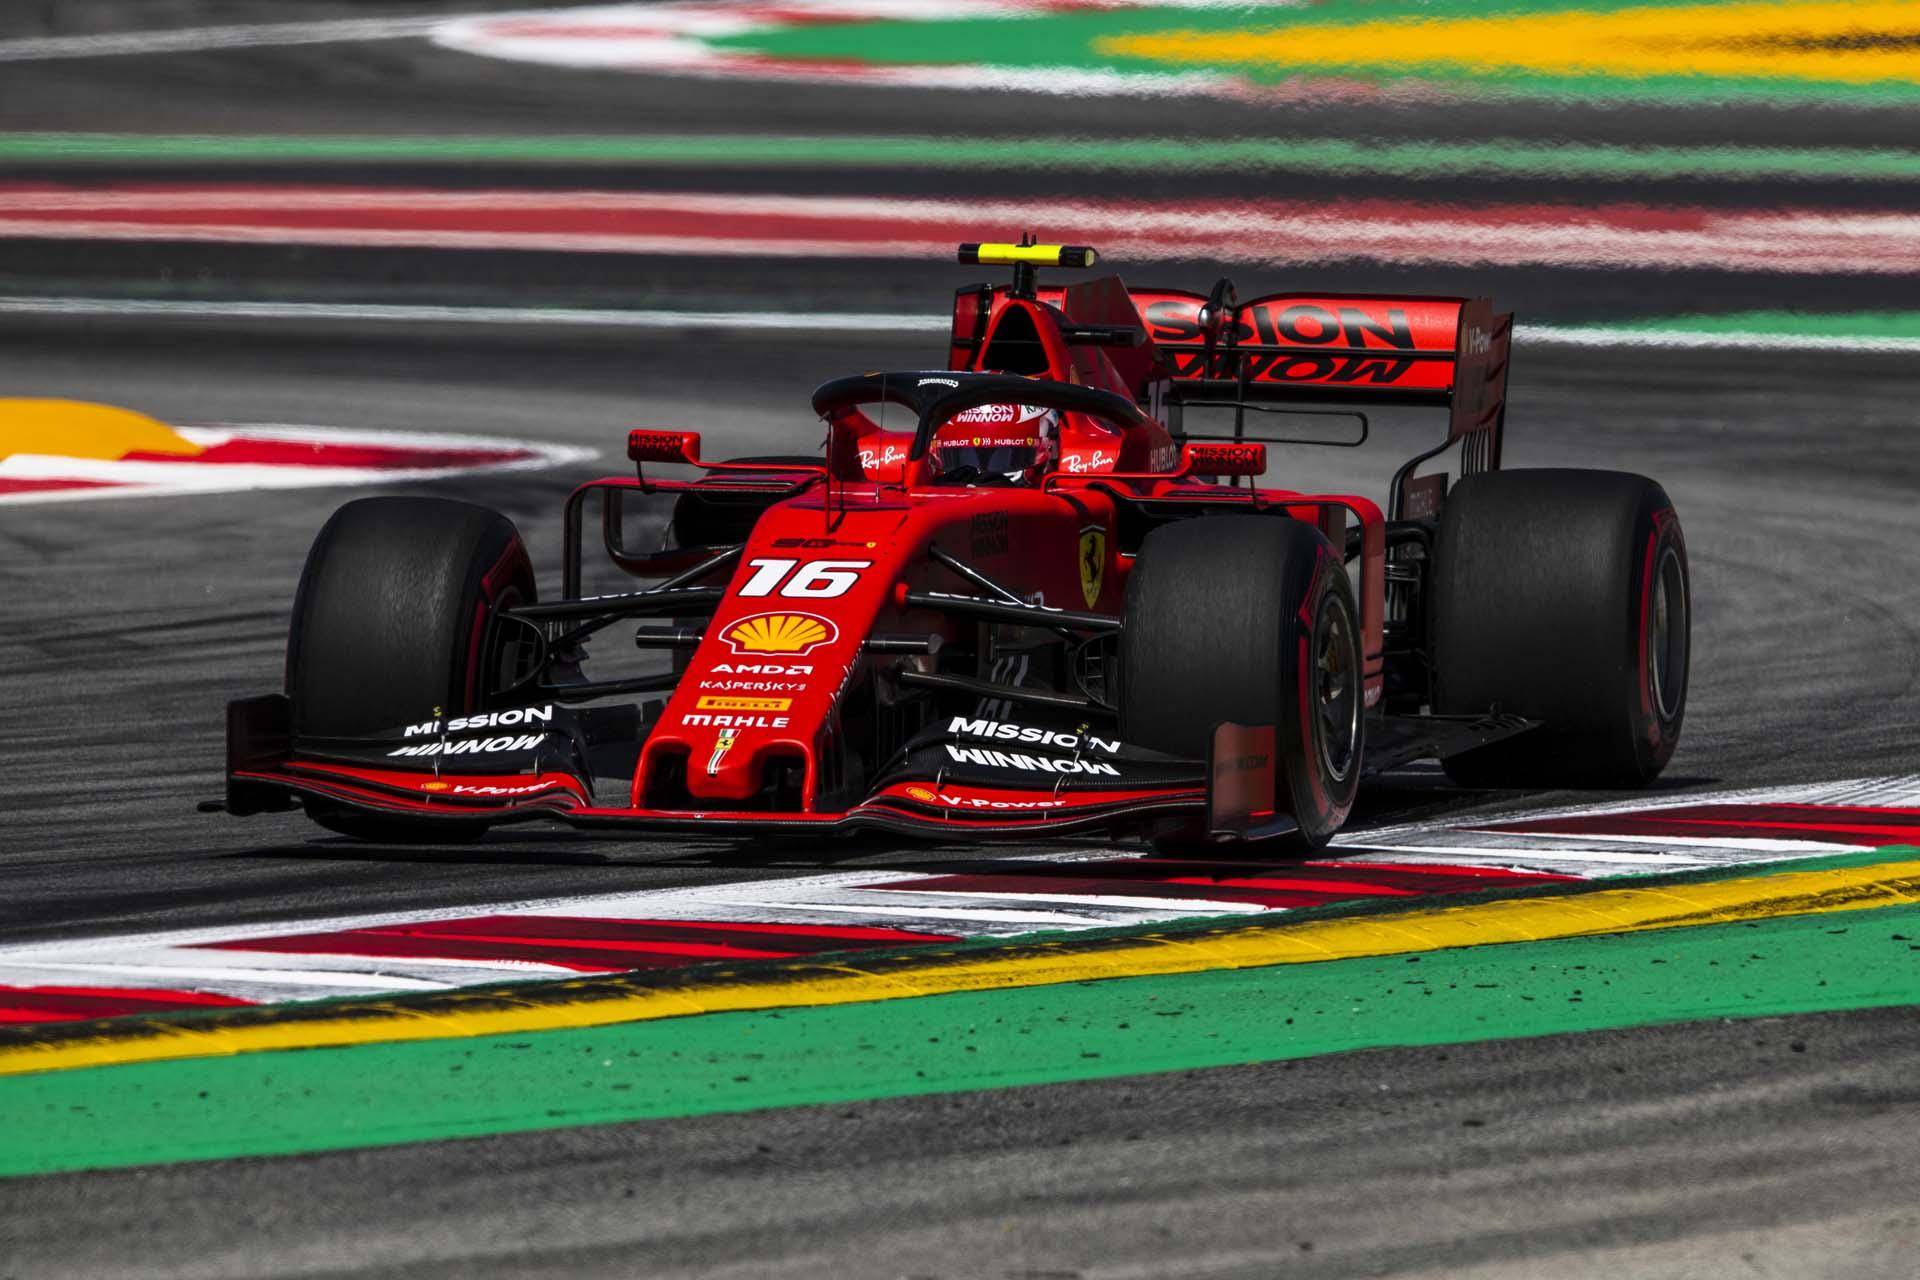 SpanishGP2019_FRI_Ferrari_190016_gp_spa